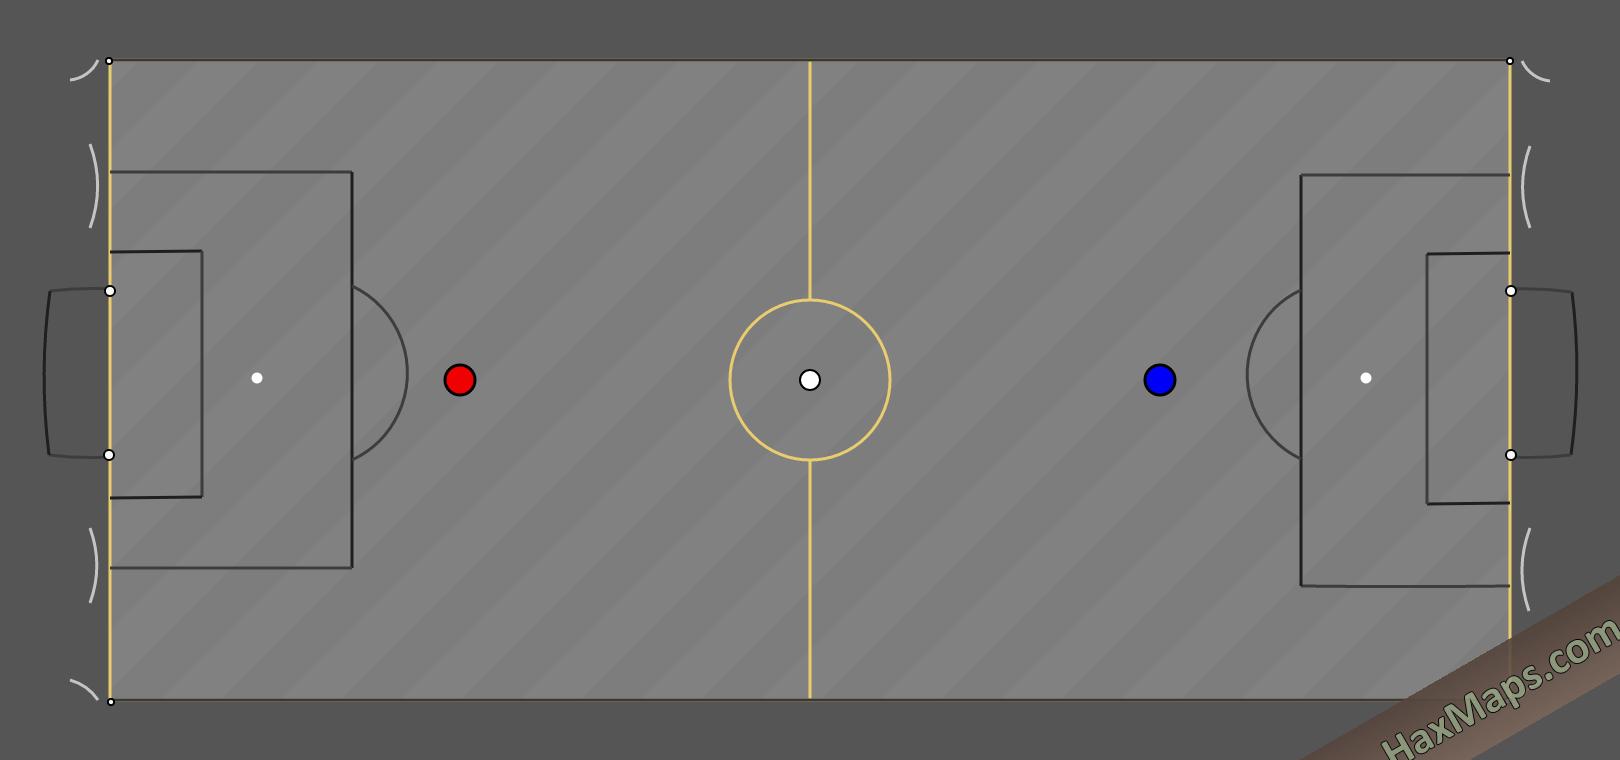 hax ball maps   Boundless SpaceBounce